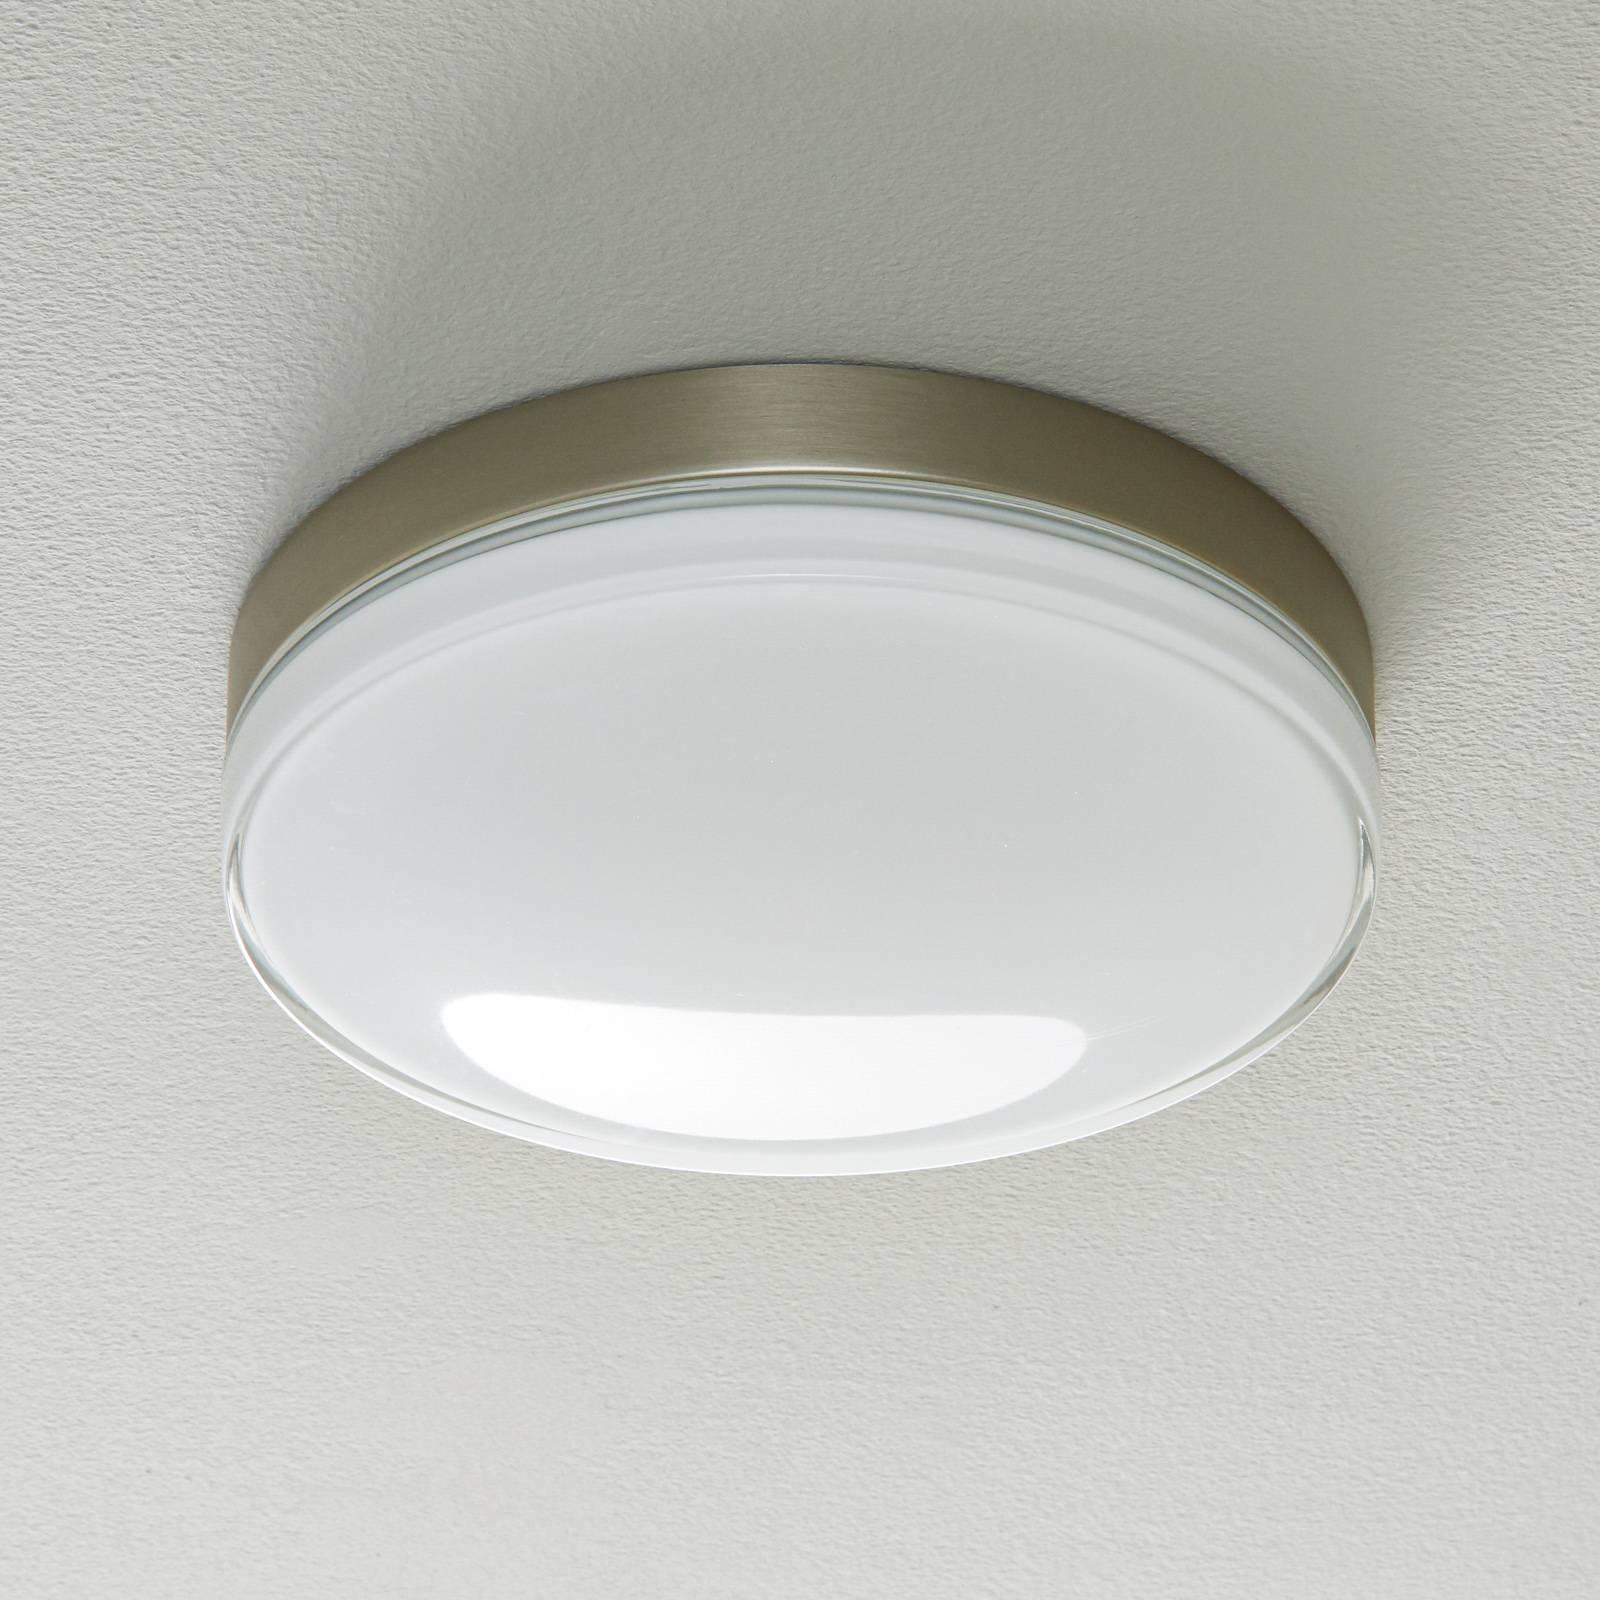 BEGA 12128 LED-kattovalaisin DALI 930 teräs 30,5cm